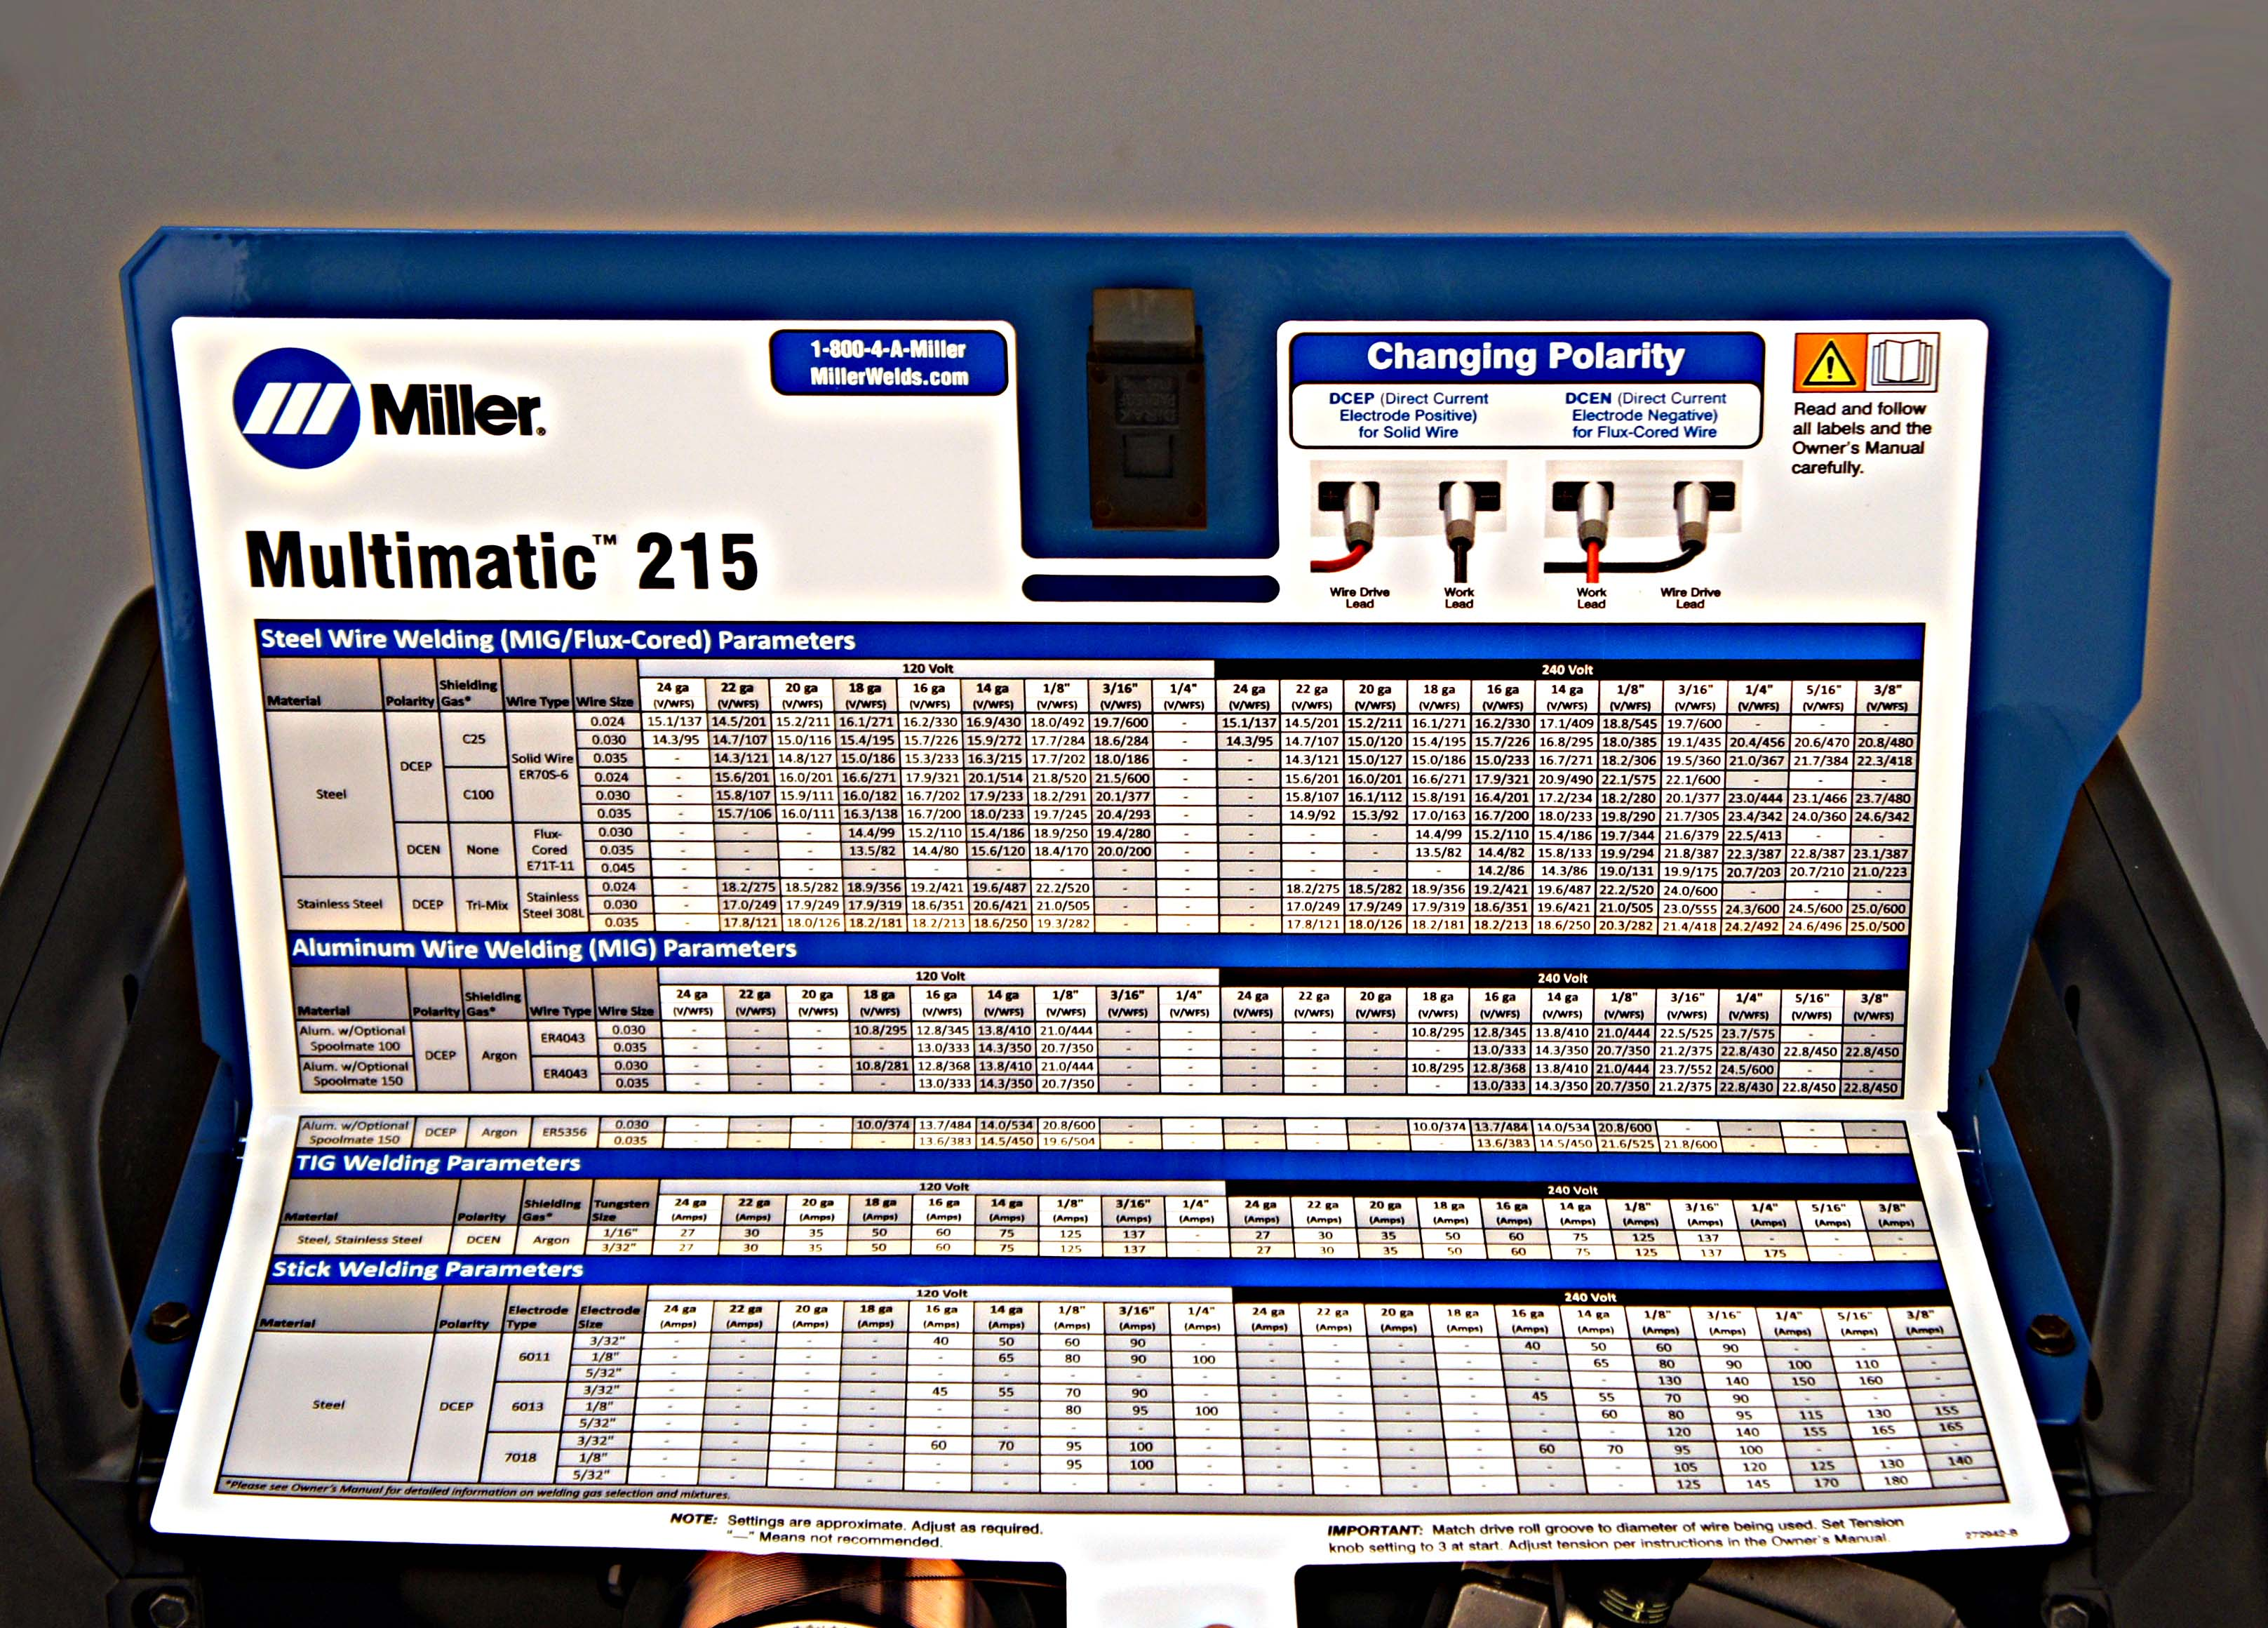 miller spool gun wiring diagram trusted wiring diagram miller trailblazer 250 miller 30a wiring diagram trusted [ 3233 x 2320 Pixel ]